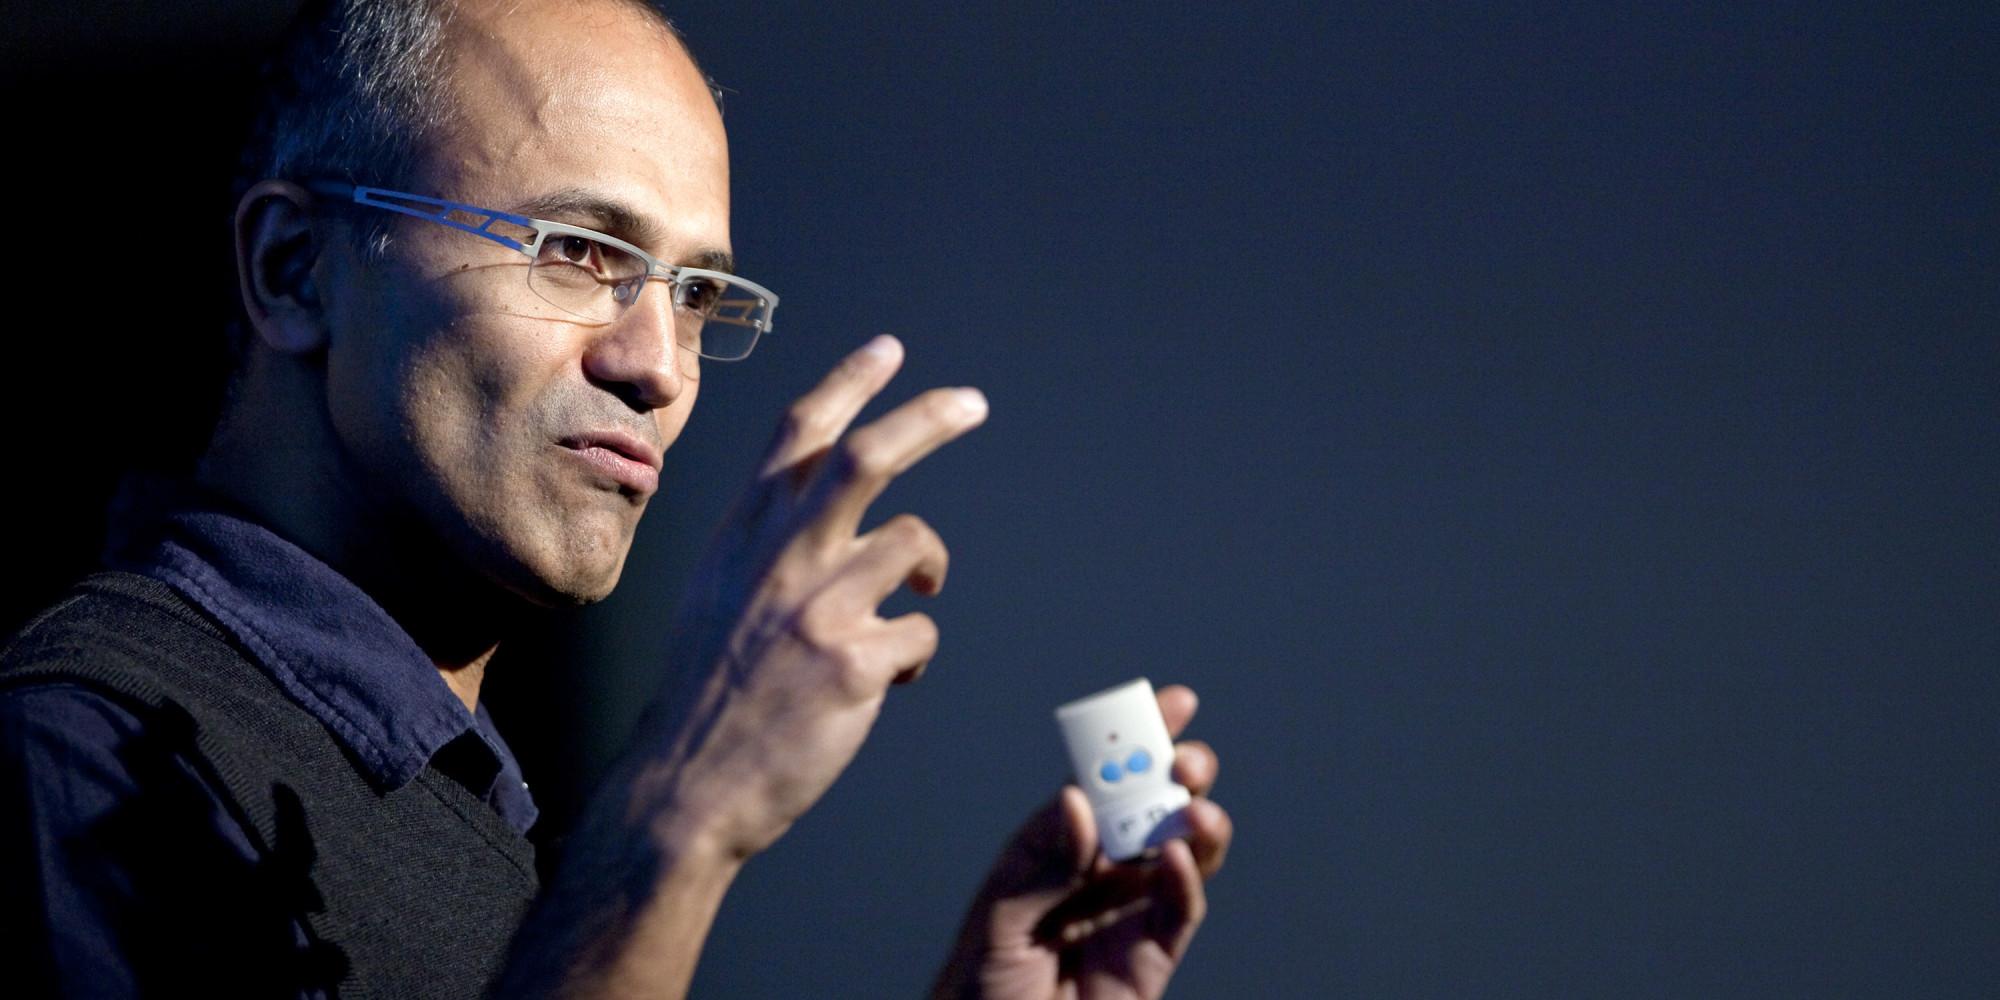 Microsoft's future unleashed